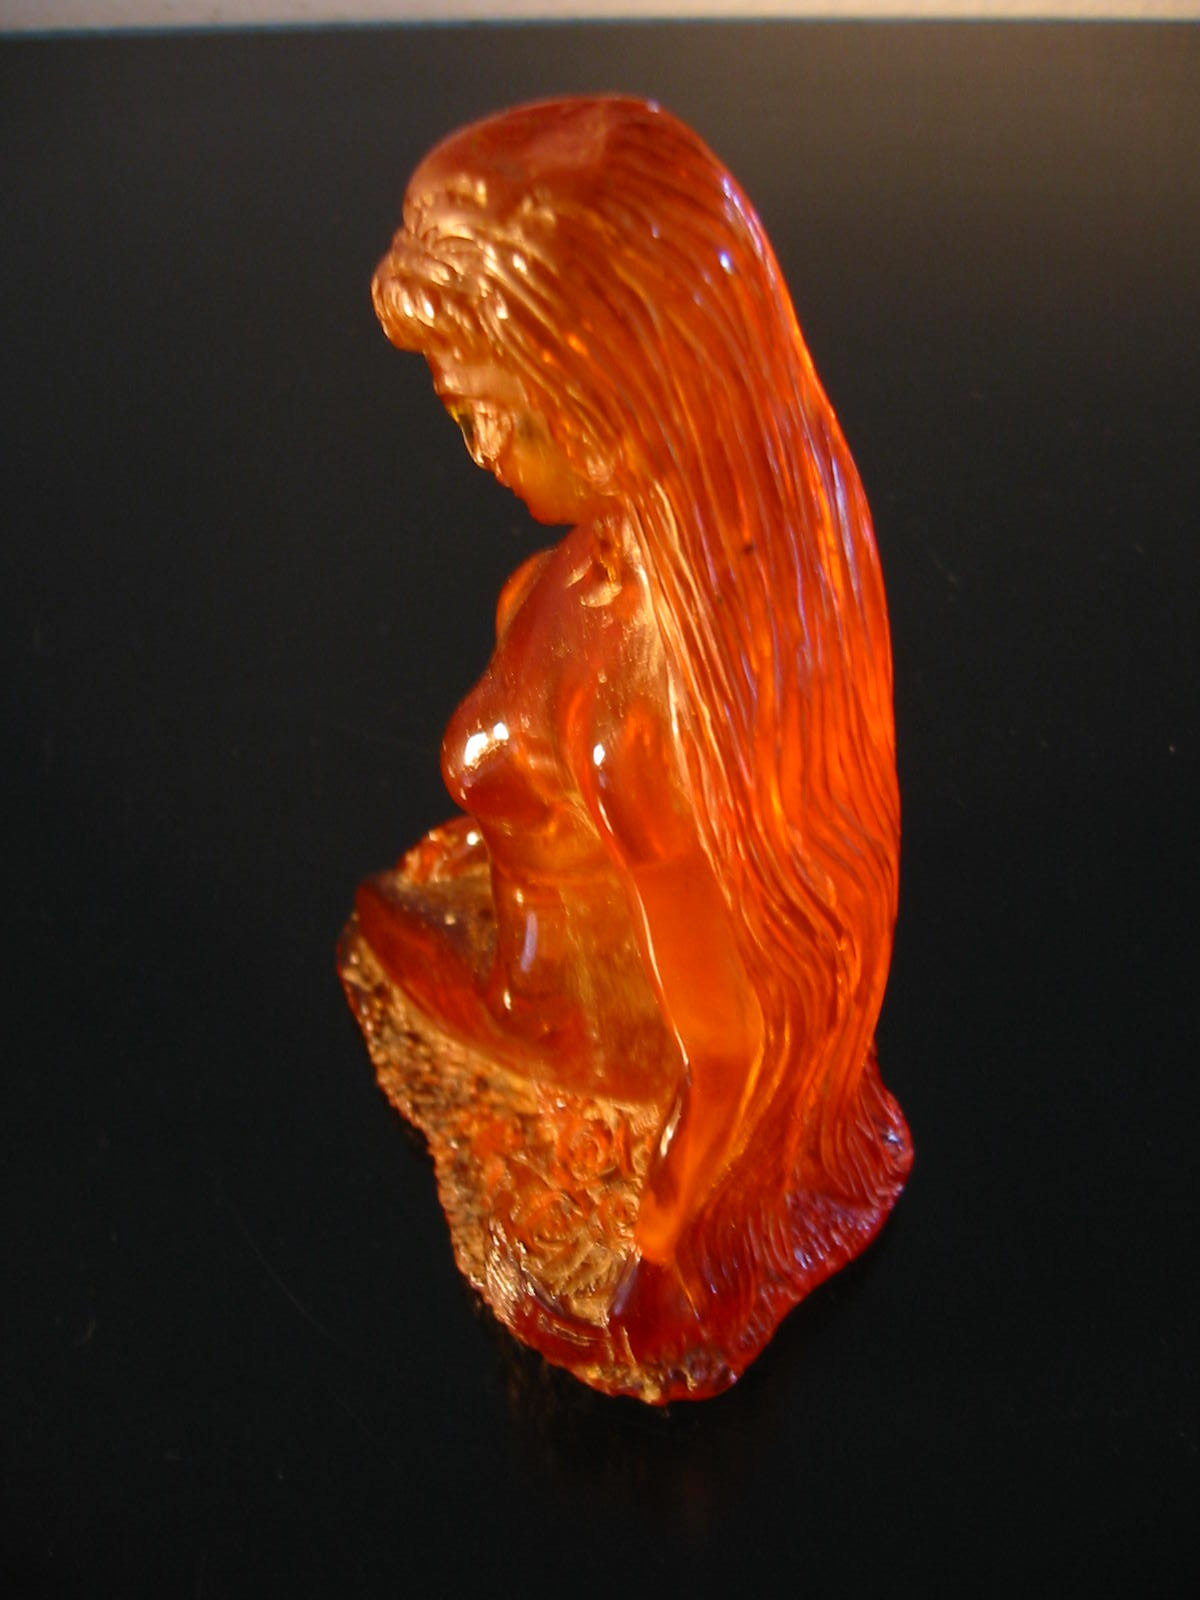 art deco resin nude amber figurine for sale classifieds. Black Bedroom Furniture Sets. Home Design Ideas